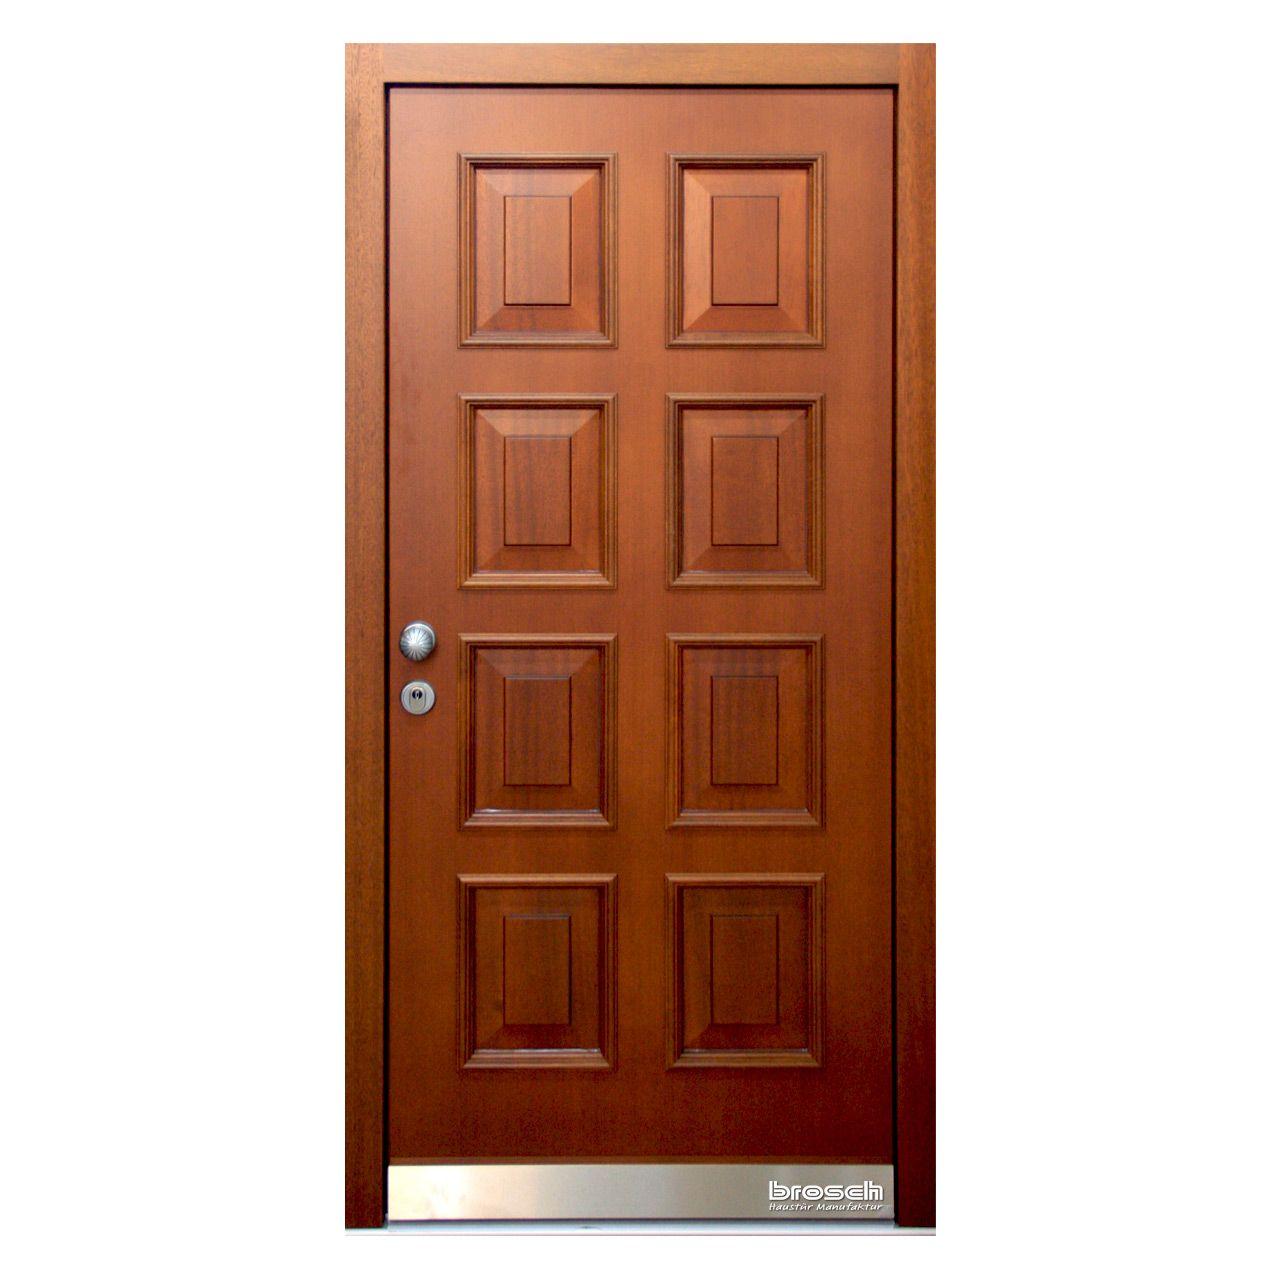 Klassische Haustüren klassische haustüren aus holz mayfair 130 klassische haustüren